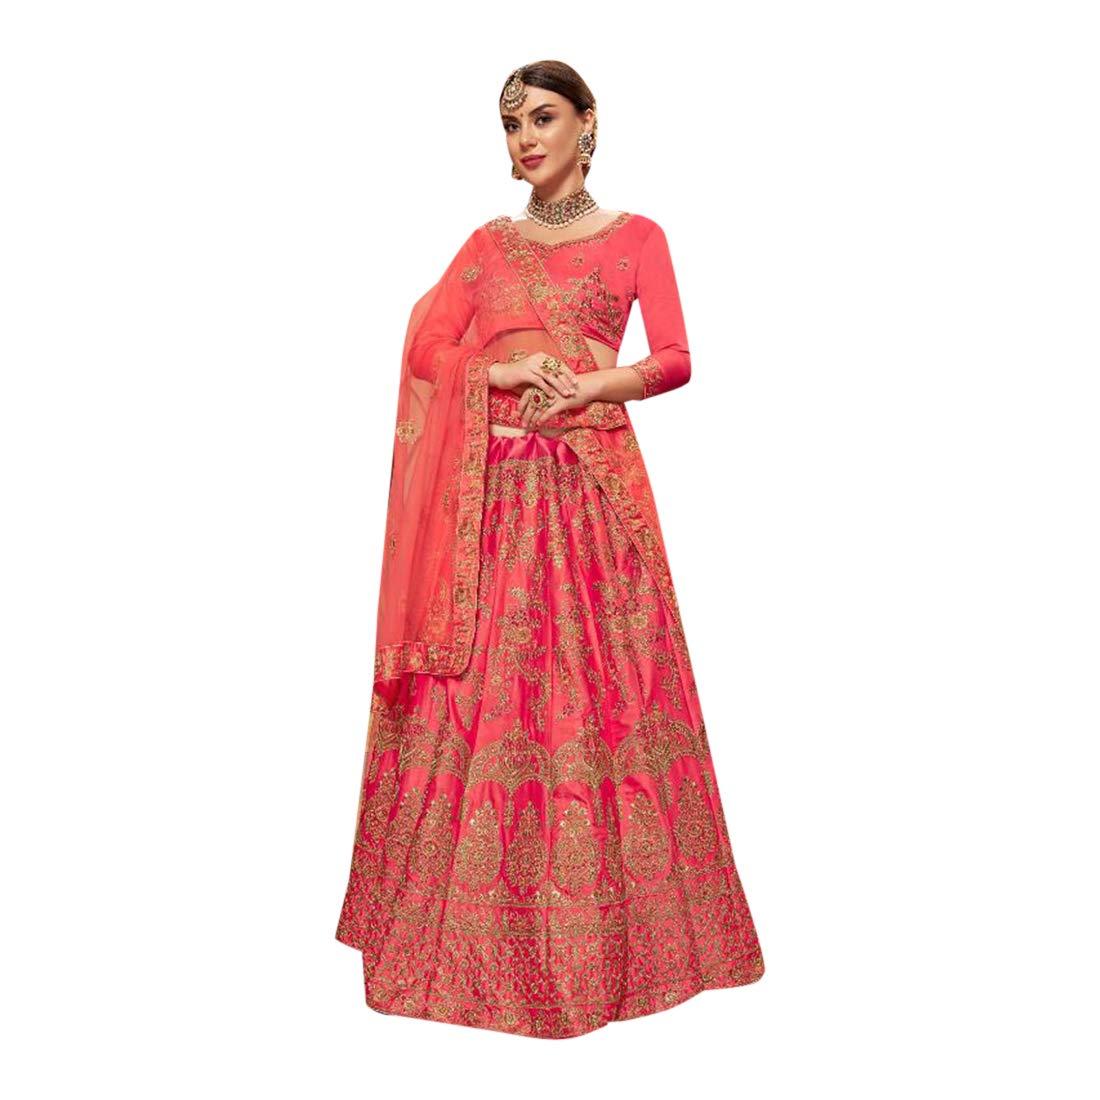 Pink Satin Silk Zari Embroidered Wedding Lehenga choli with Bridal Net Dupatta Indian Ethnic Designer Women wear 7642